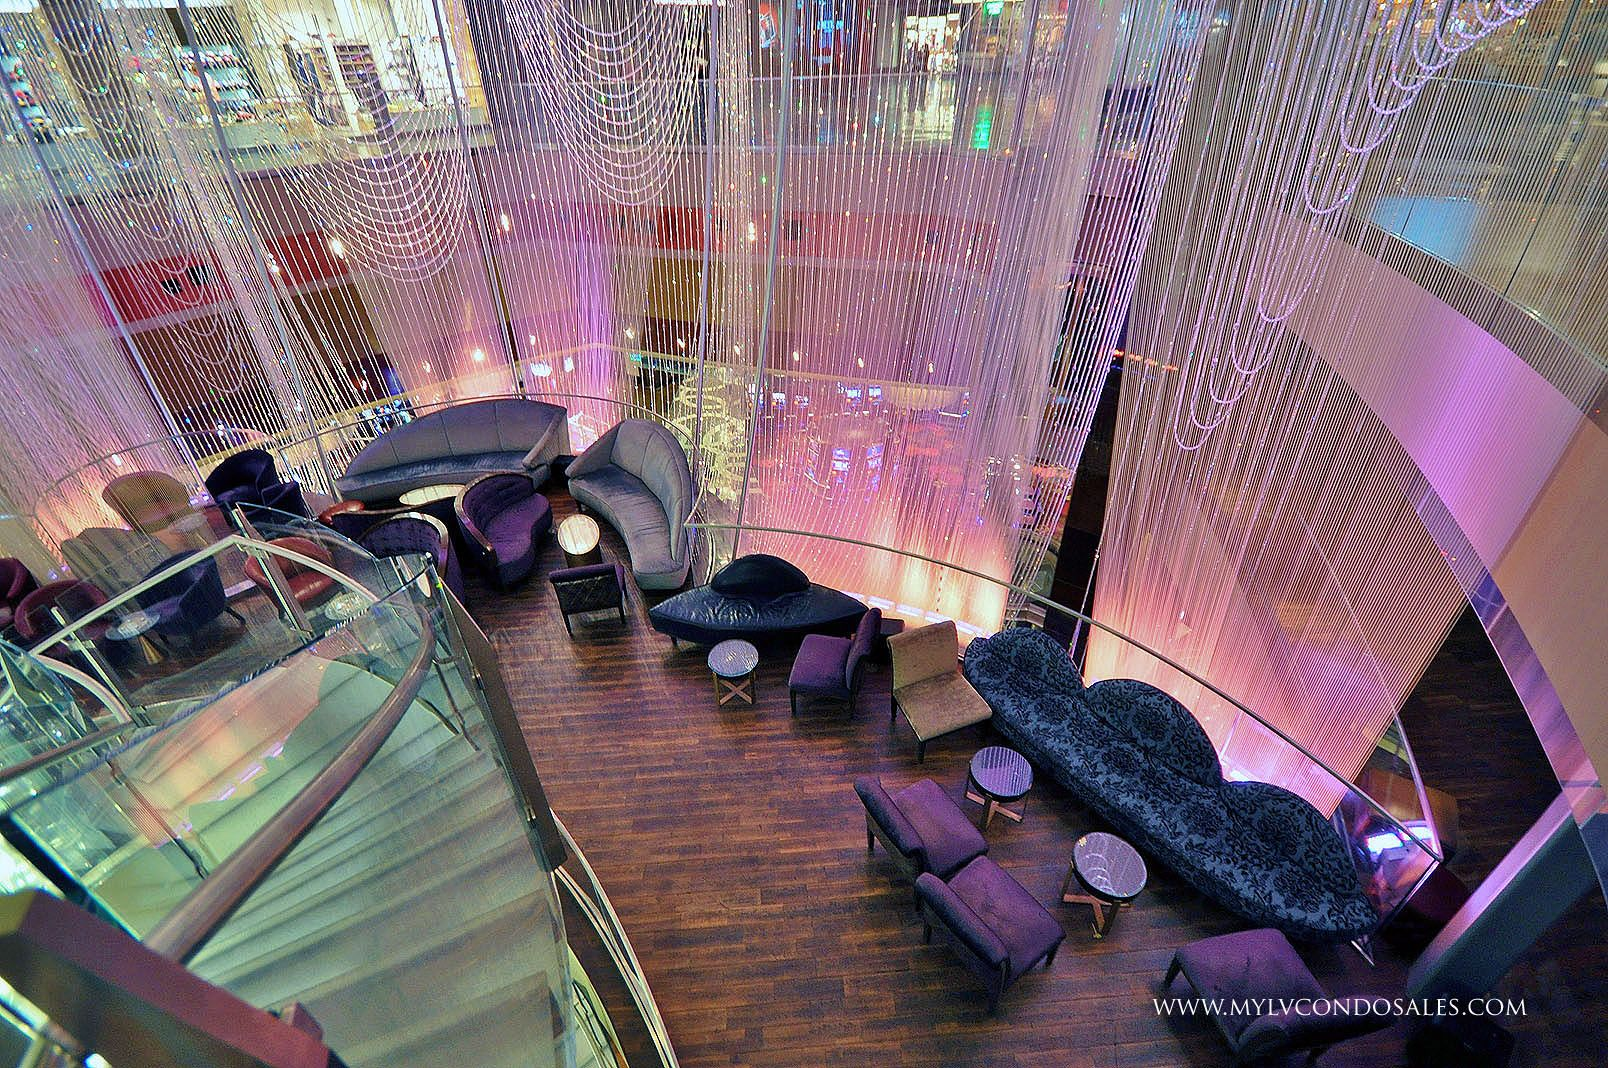 cosmopolitan las vegas | Cosmopolitan Las Vegas Condos | My ...